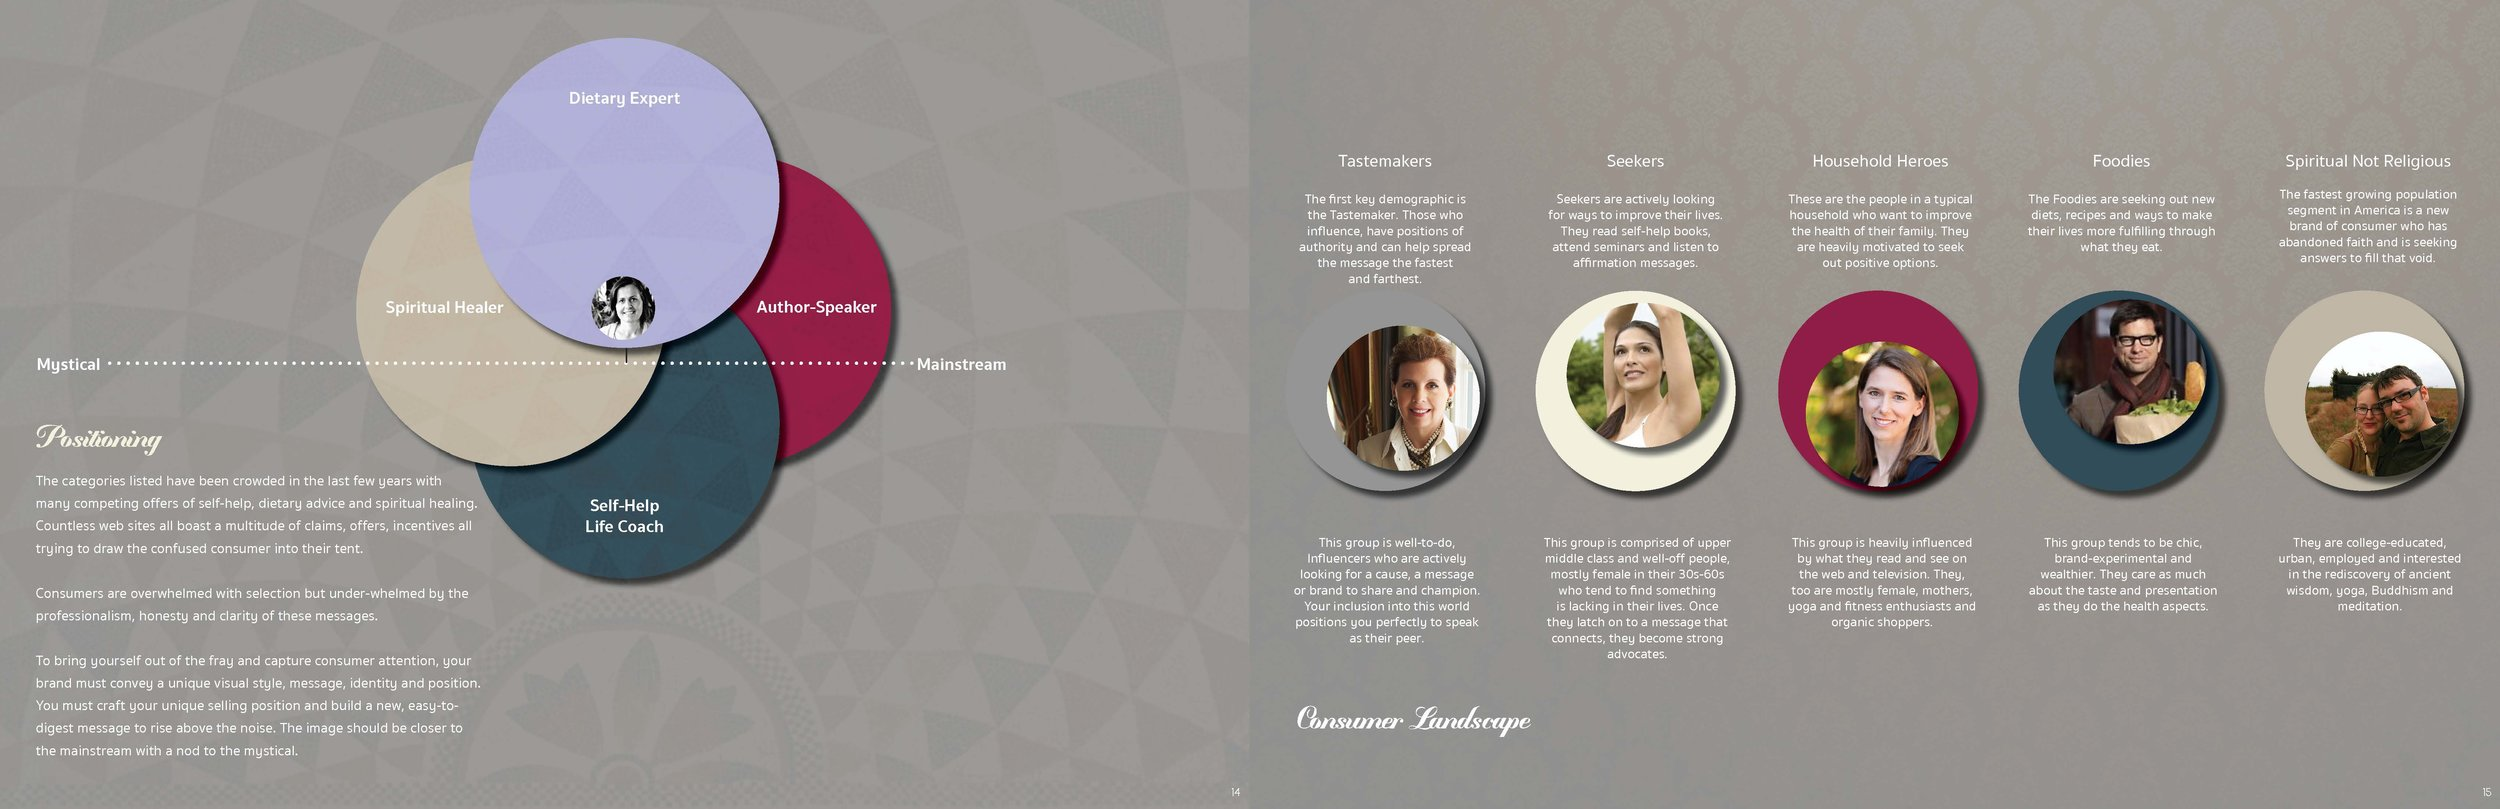 Anya Brand BibleUpdated5(lg)_Page_08.jpg